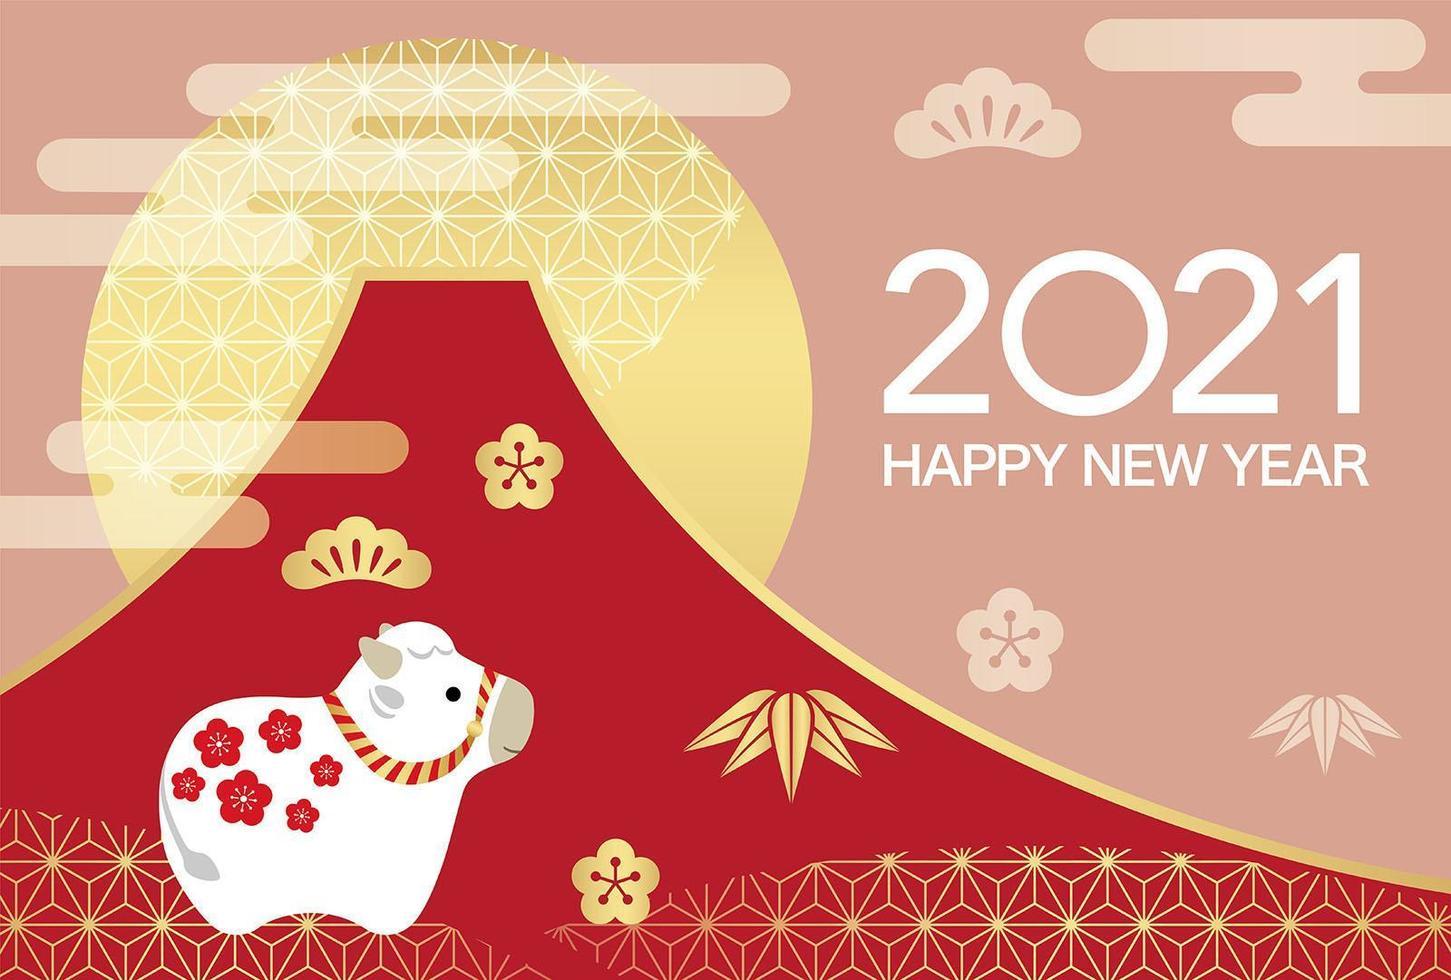 2021 happy new year of the ox design download free vectors clipart graphics vector art 2021 happy new year of the ox design